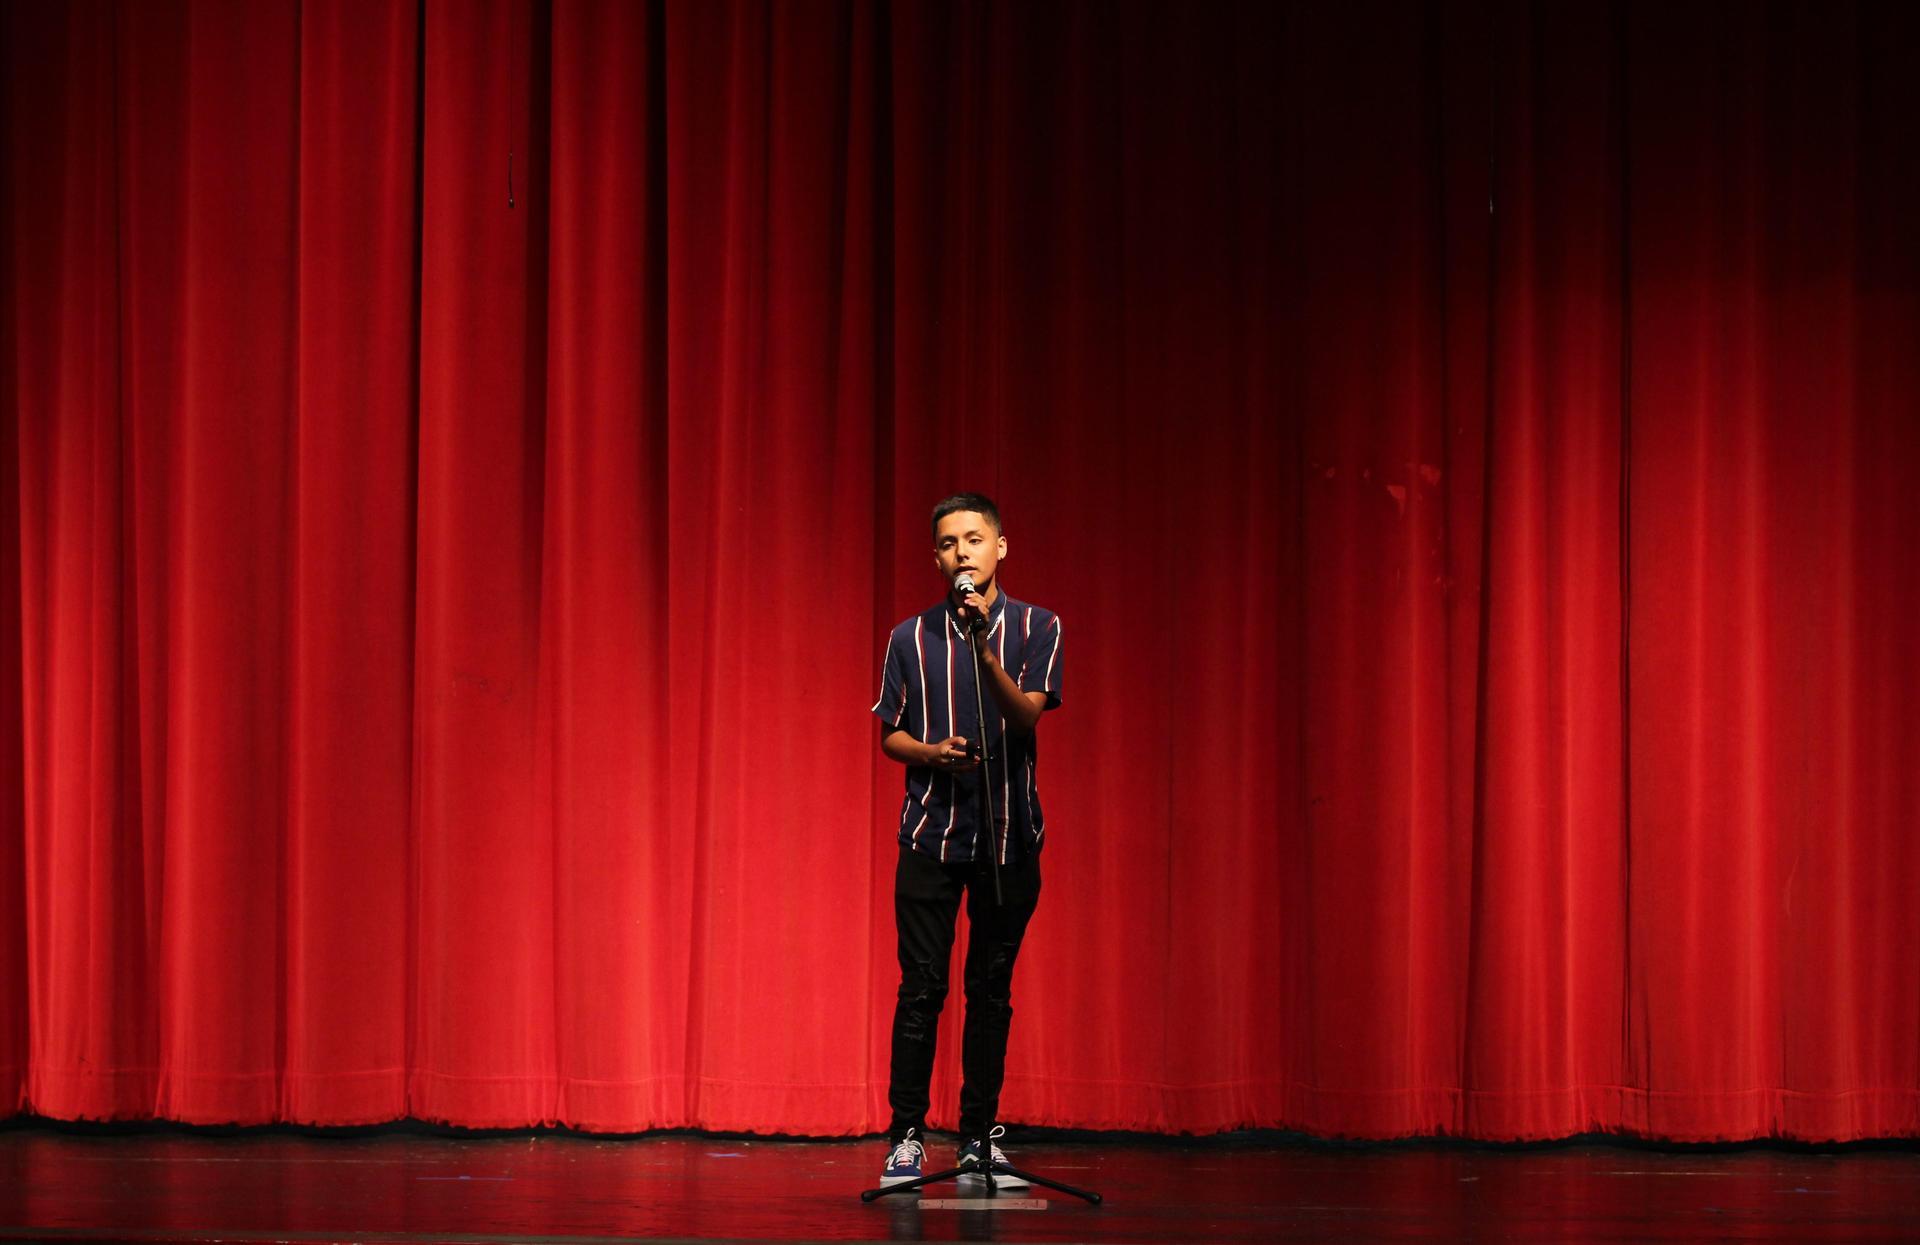 Sebastian Vega singing at the talent show